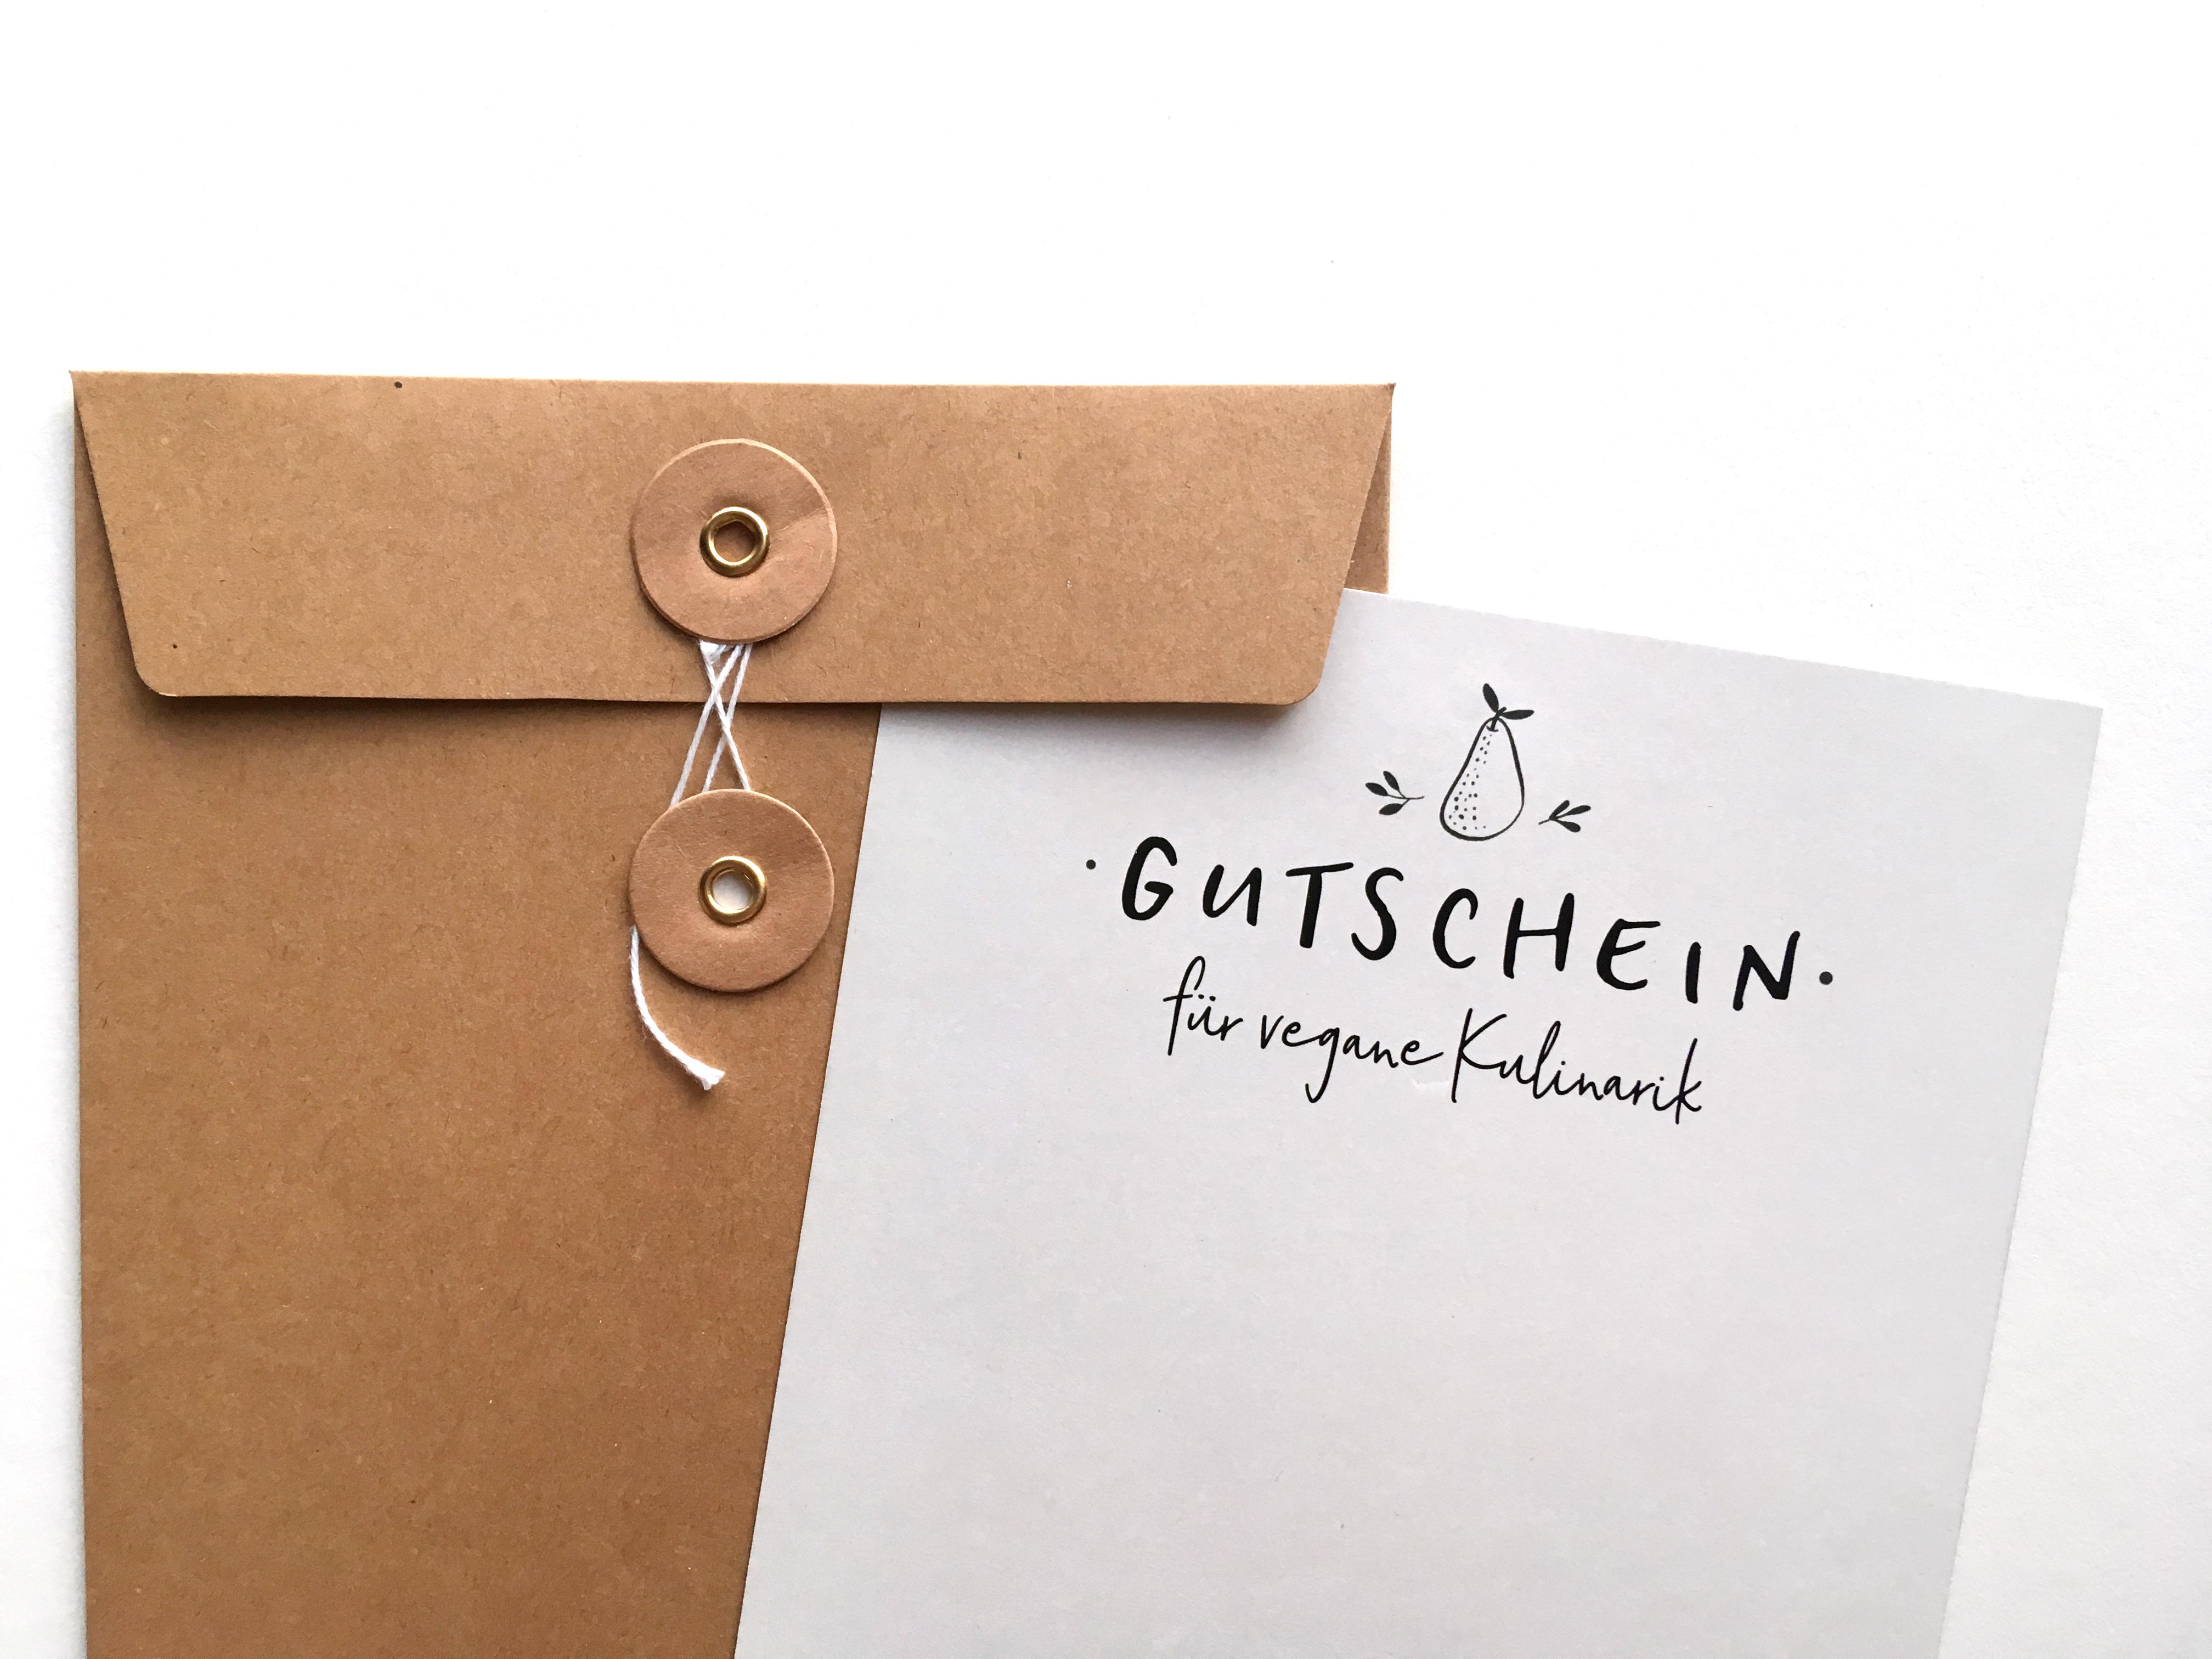 LA VIMEA Gutschein